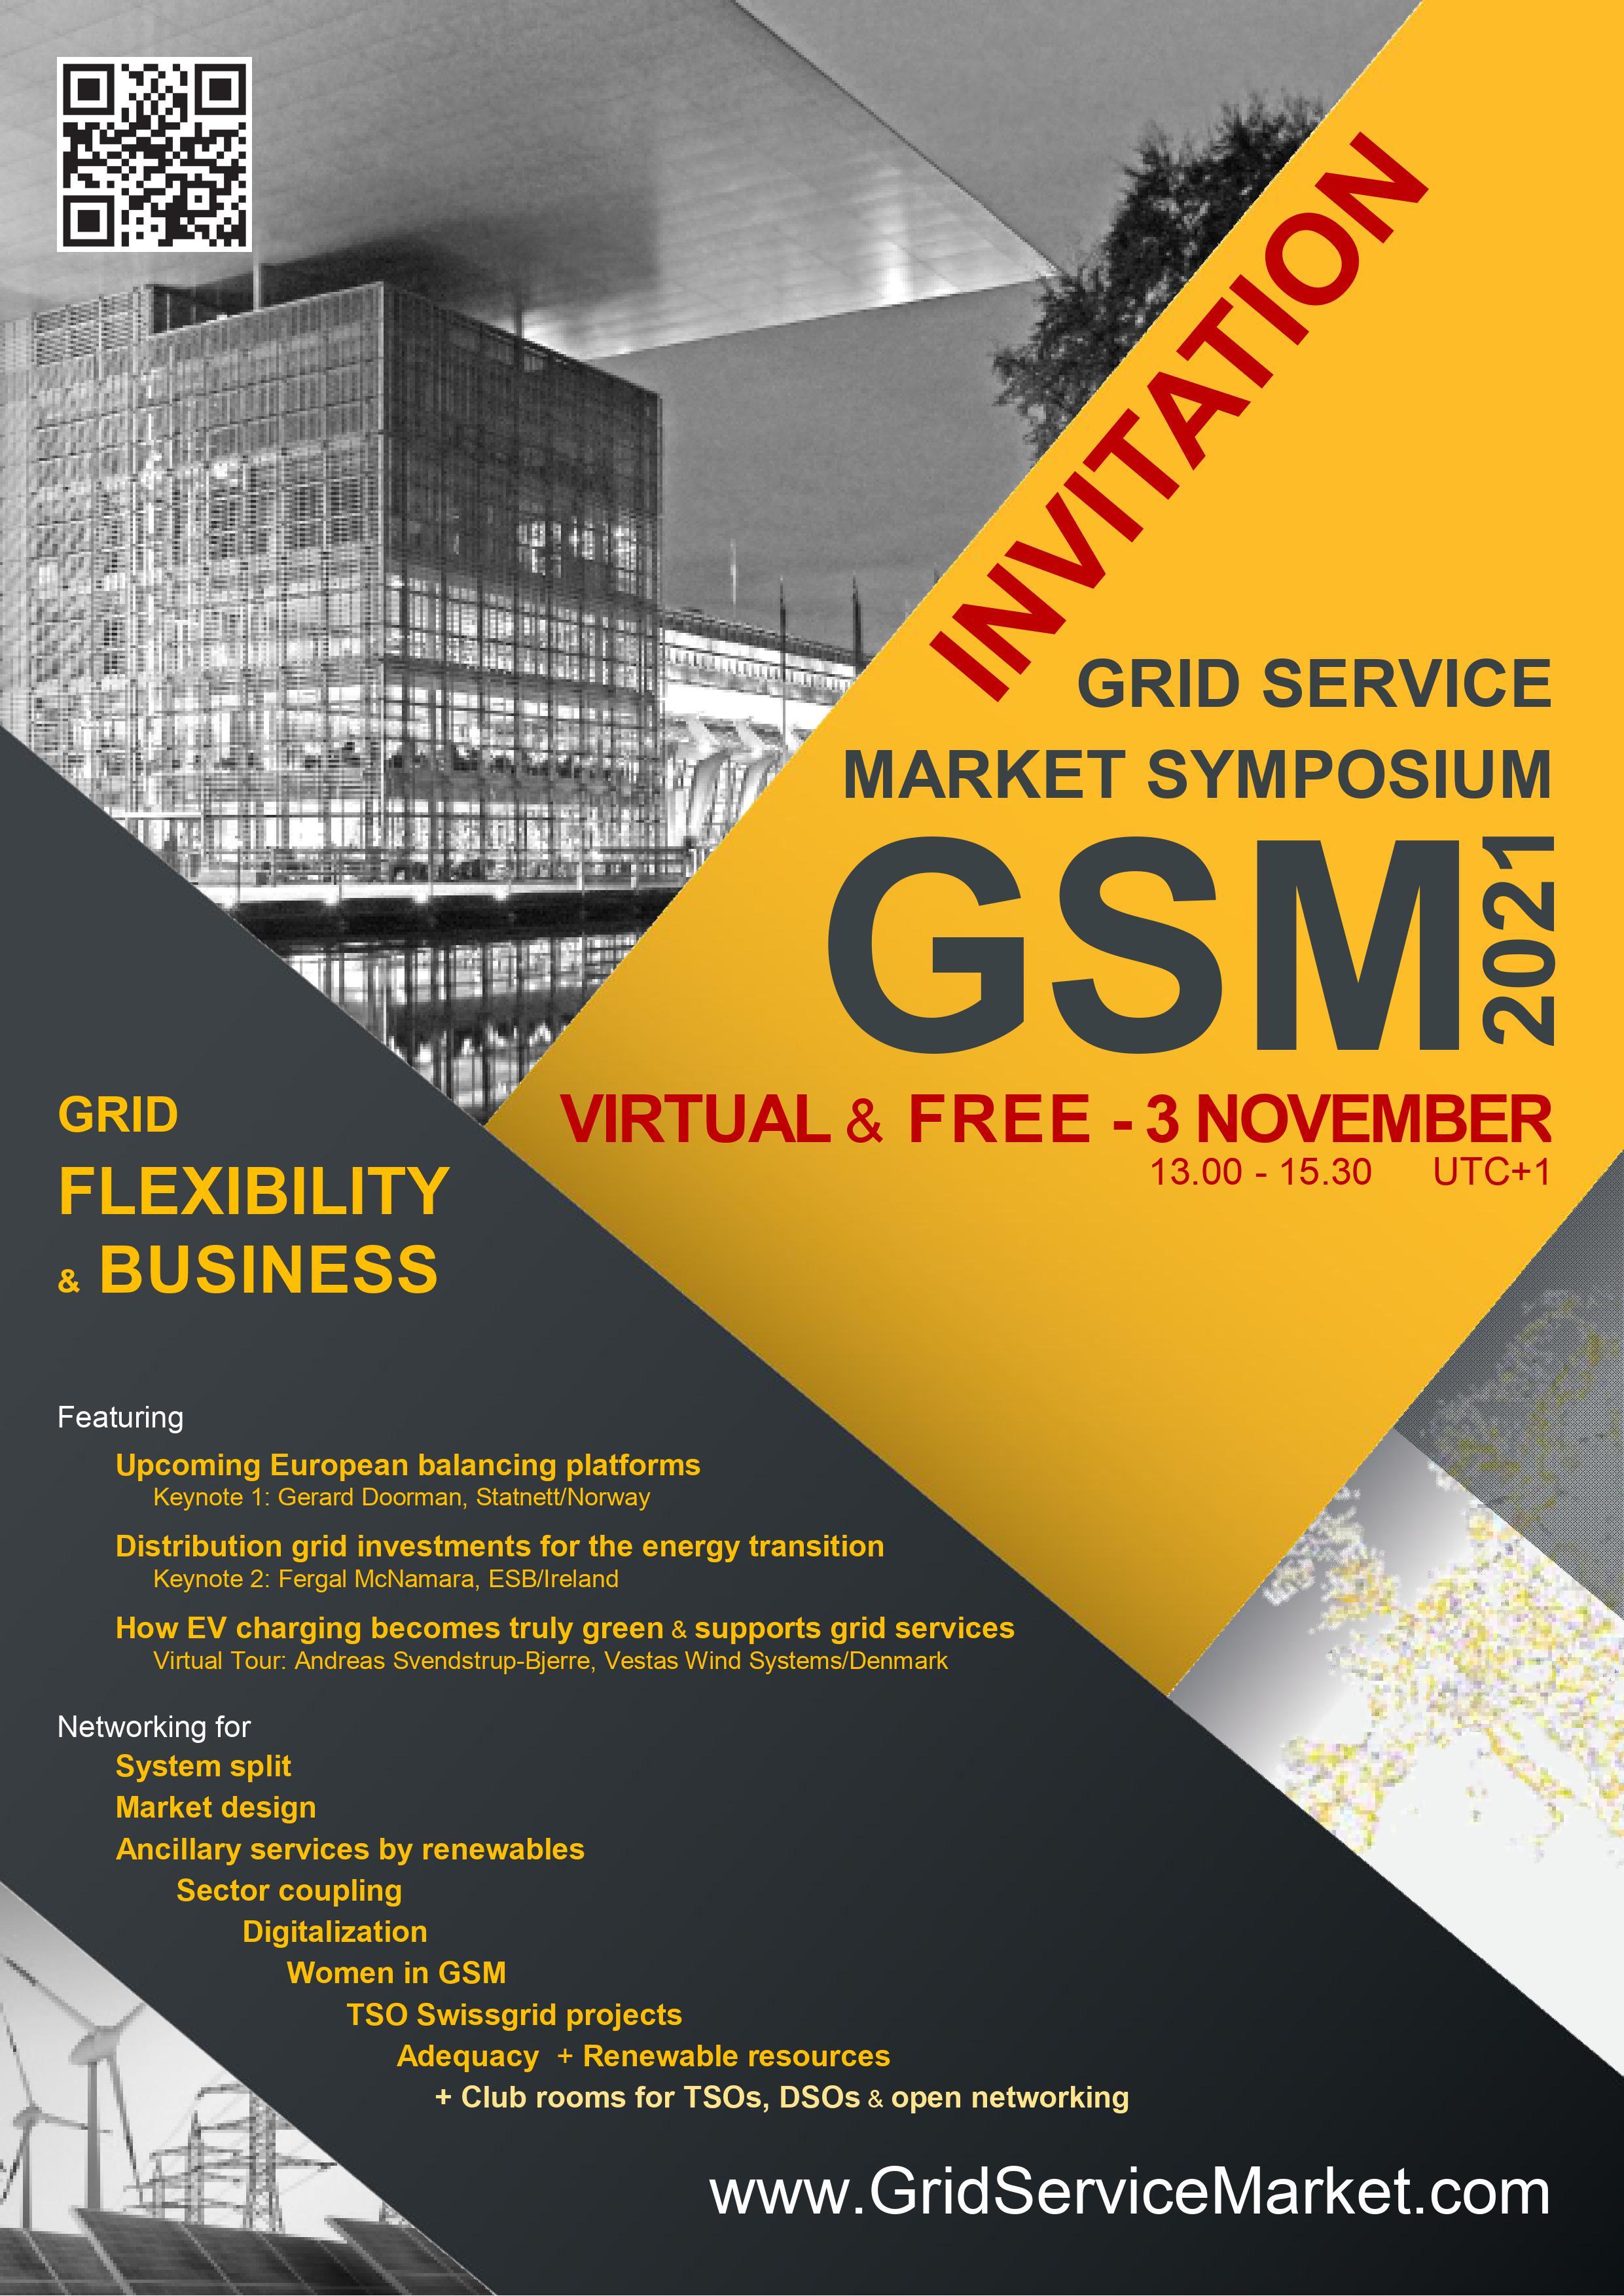 GSM-2021_Invitation-Program_Virtual-Free